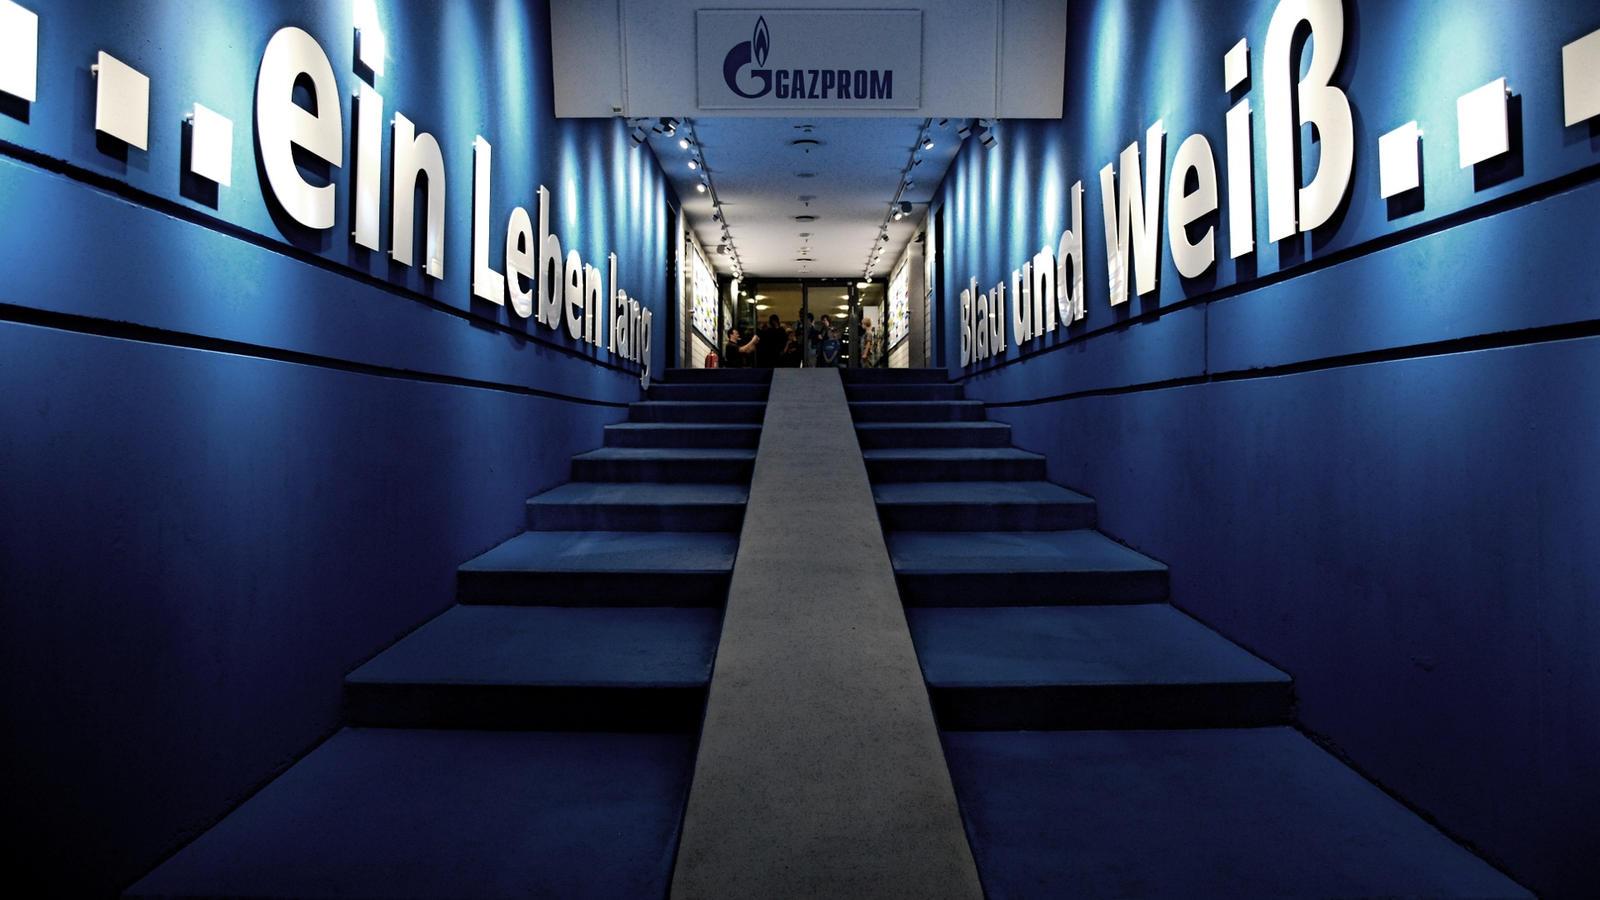 Veltins Arena Players Tunnel by JobaChamberlain